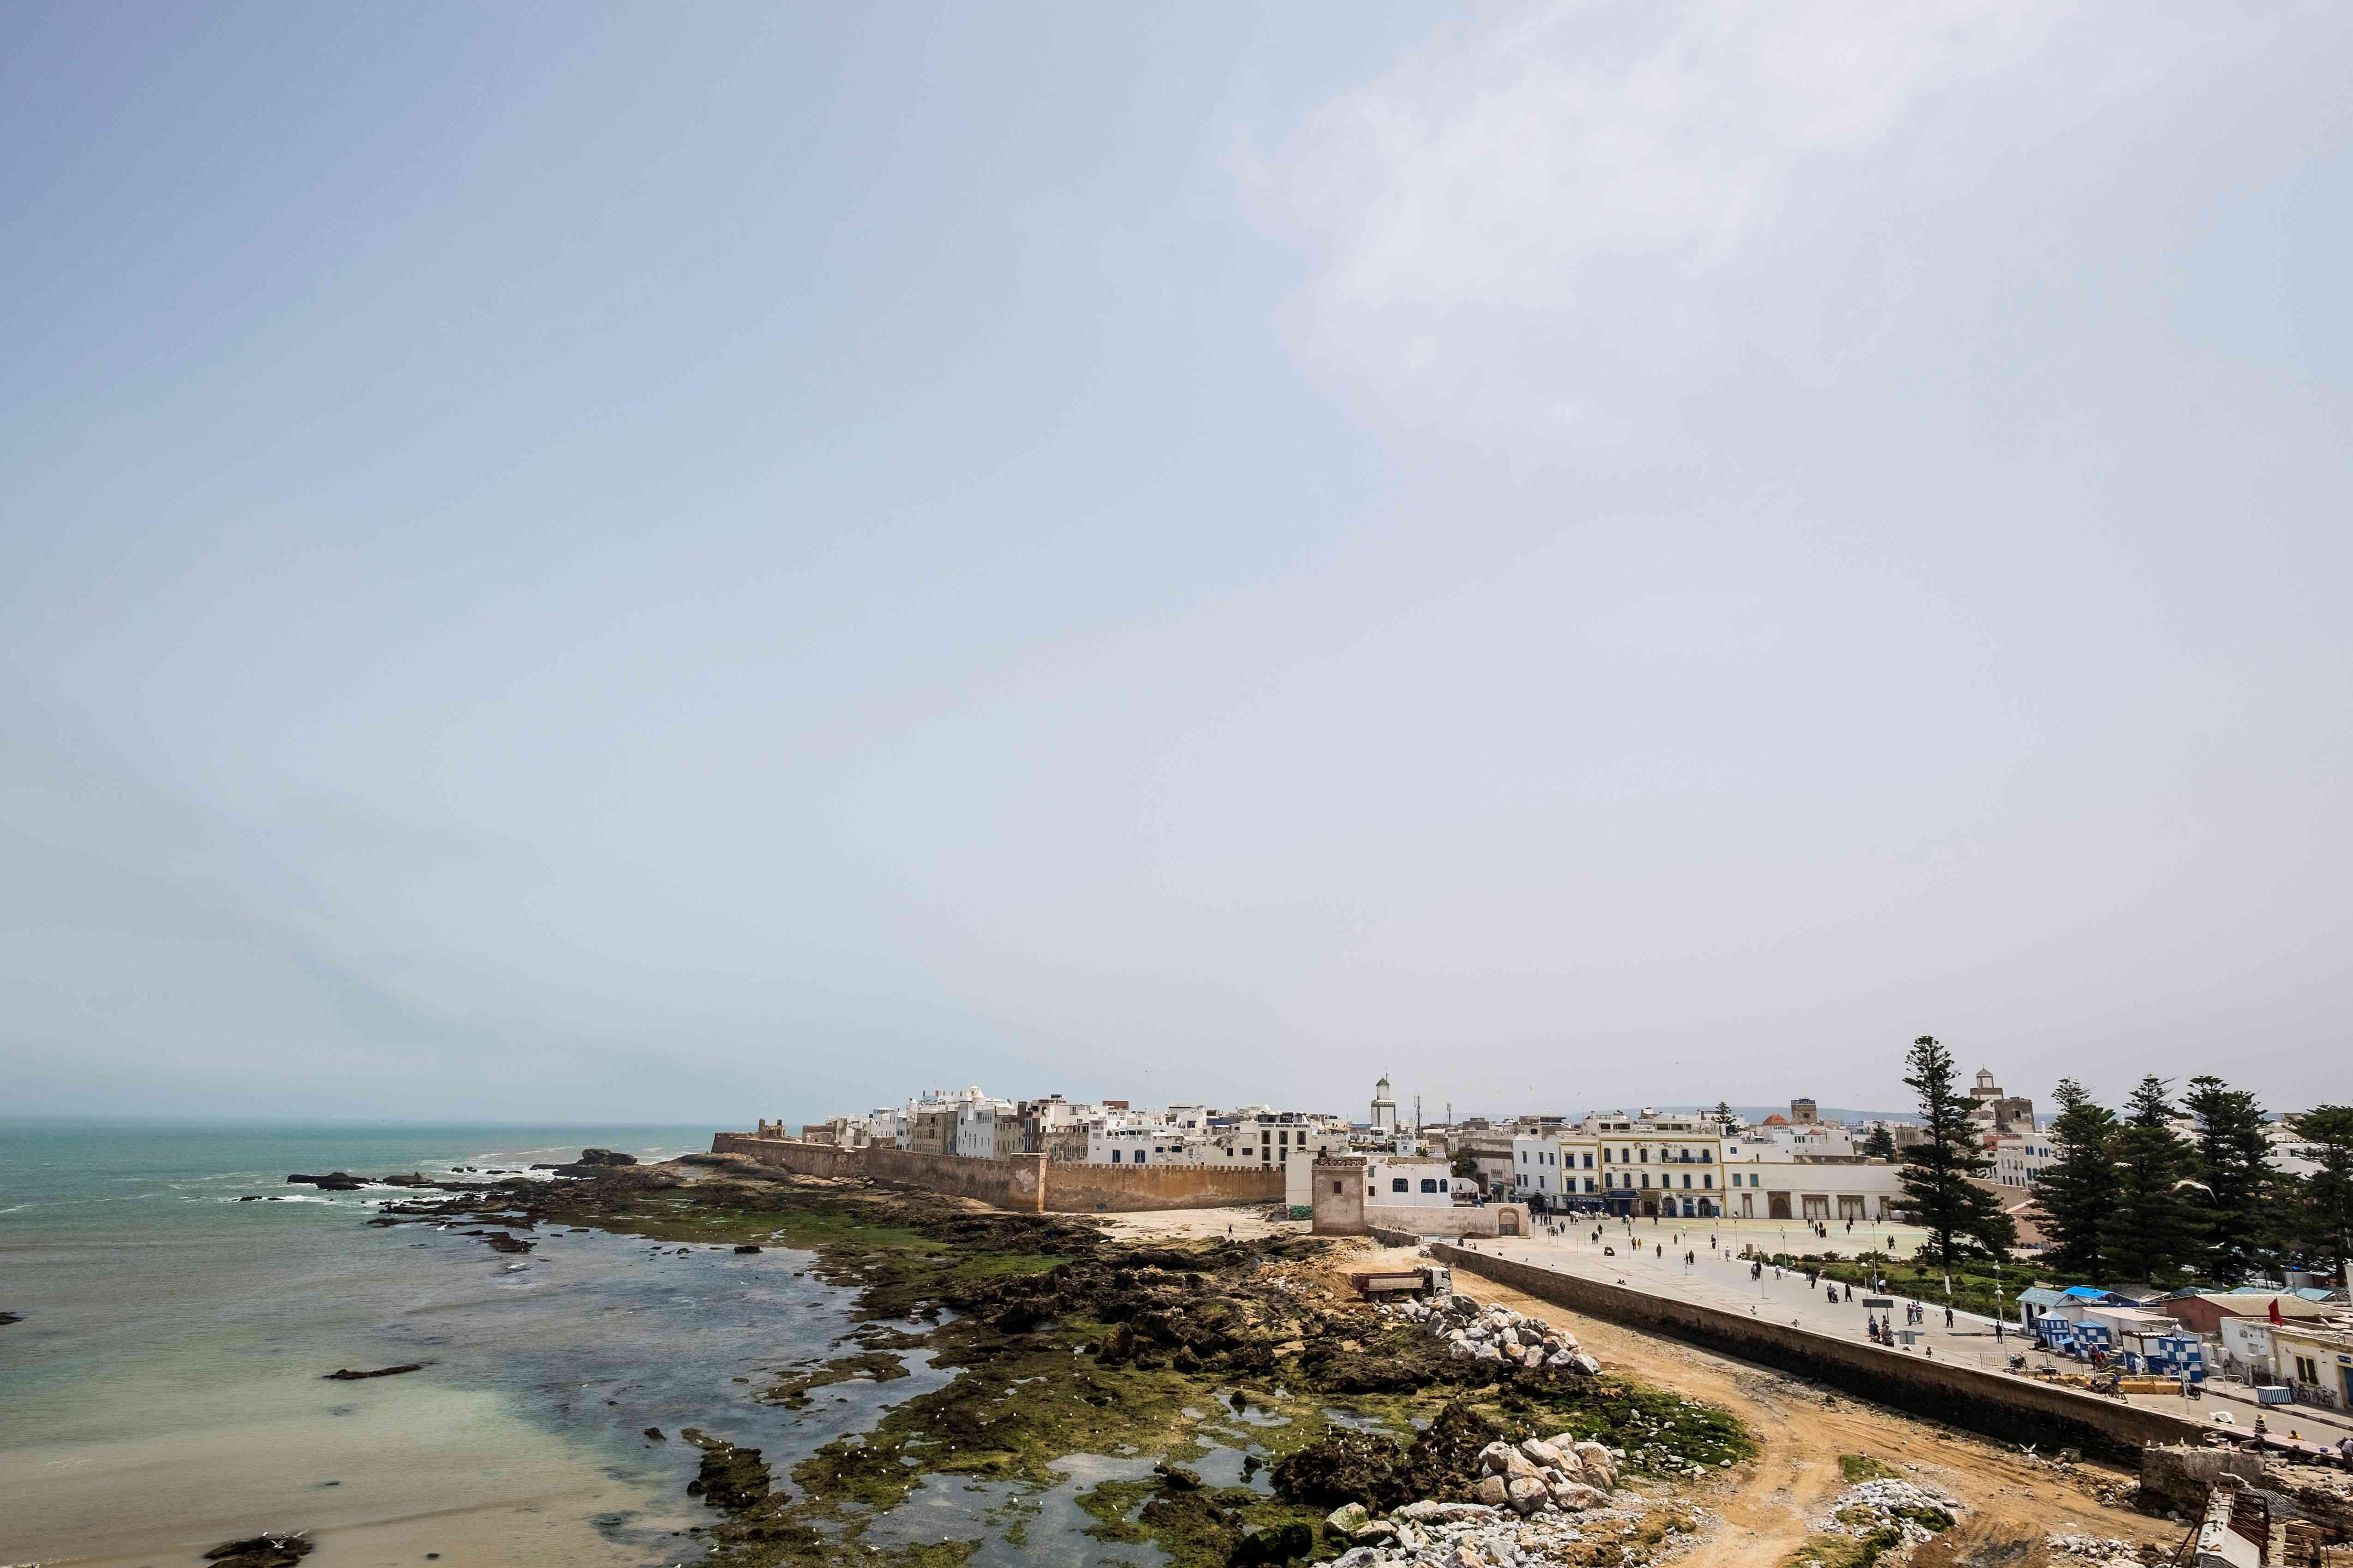 <p>A landscape view of Essaouira, a coastal town in Morocco.</p>